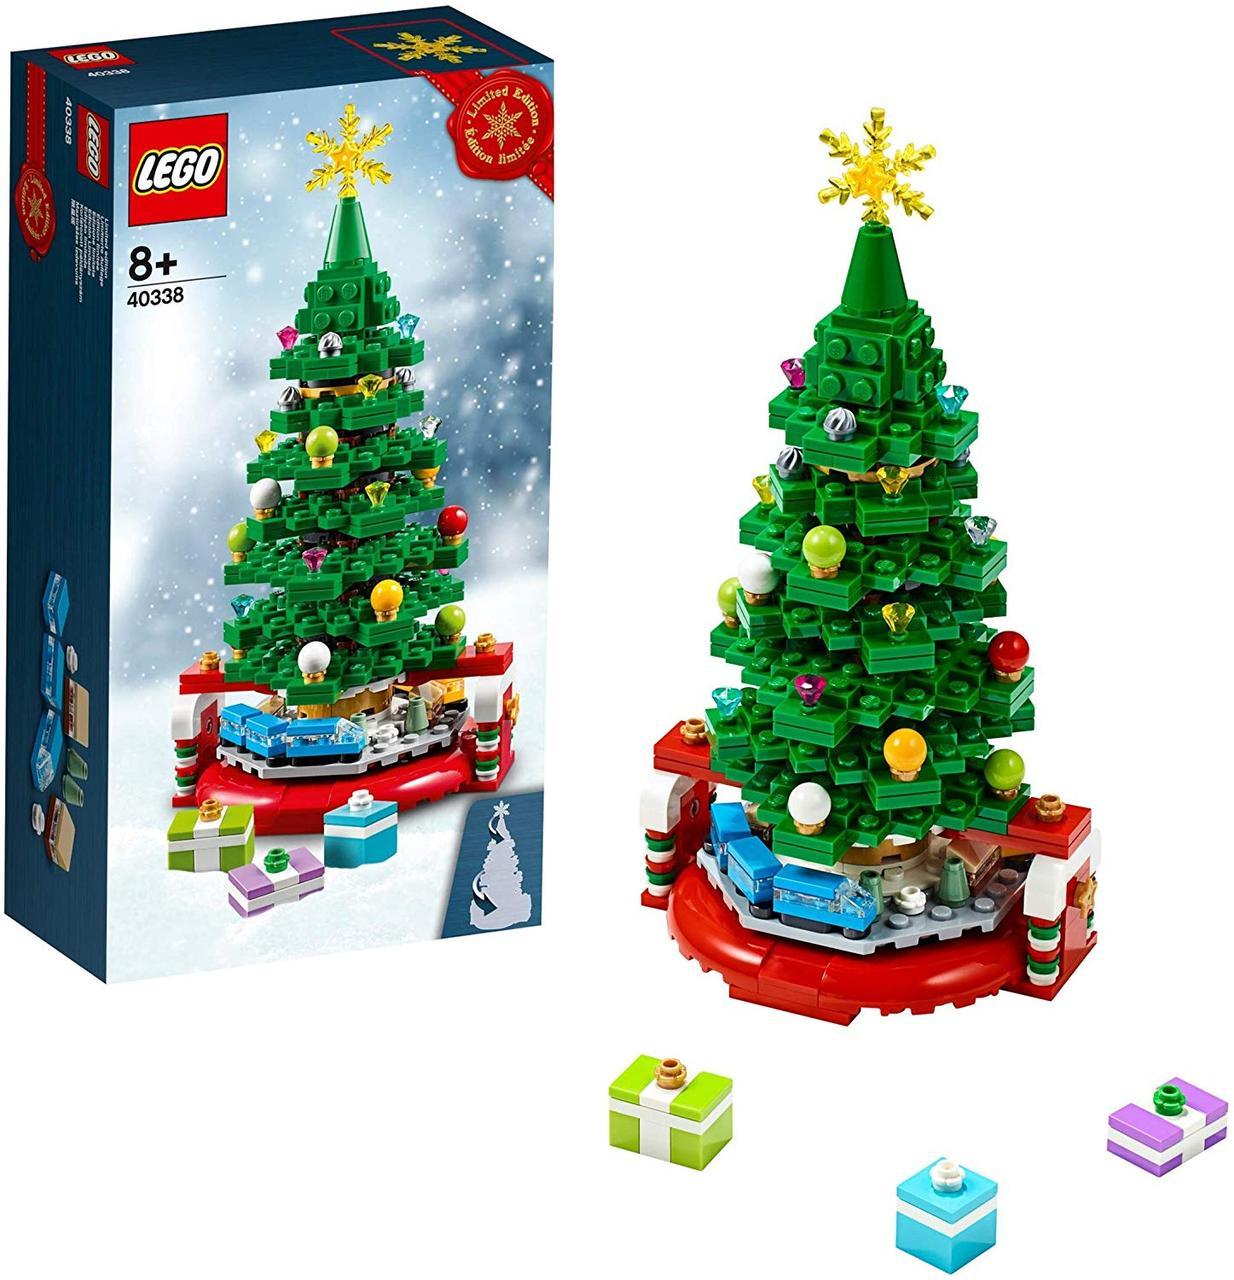 Lego Iconic Новогодняя ёлка 40338